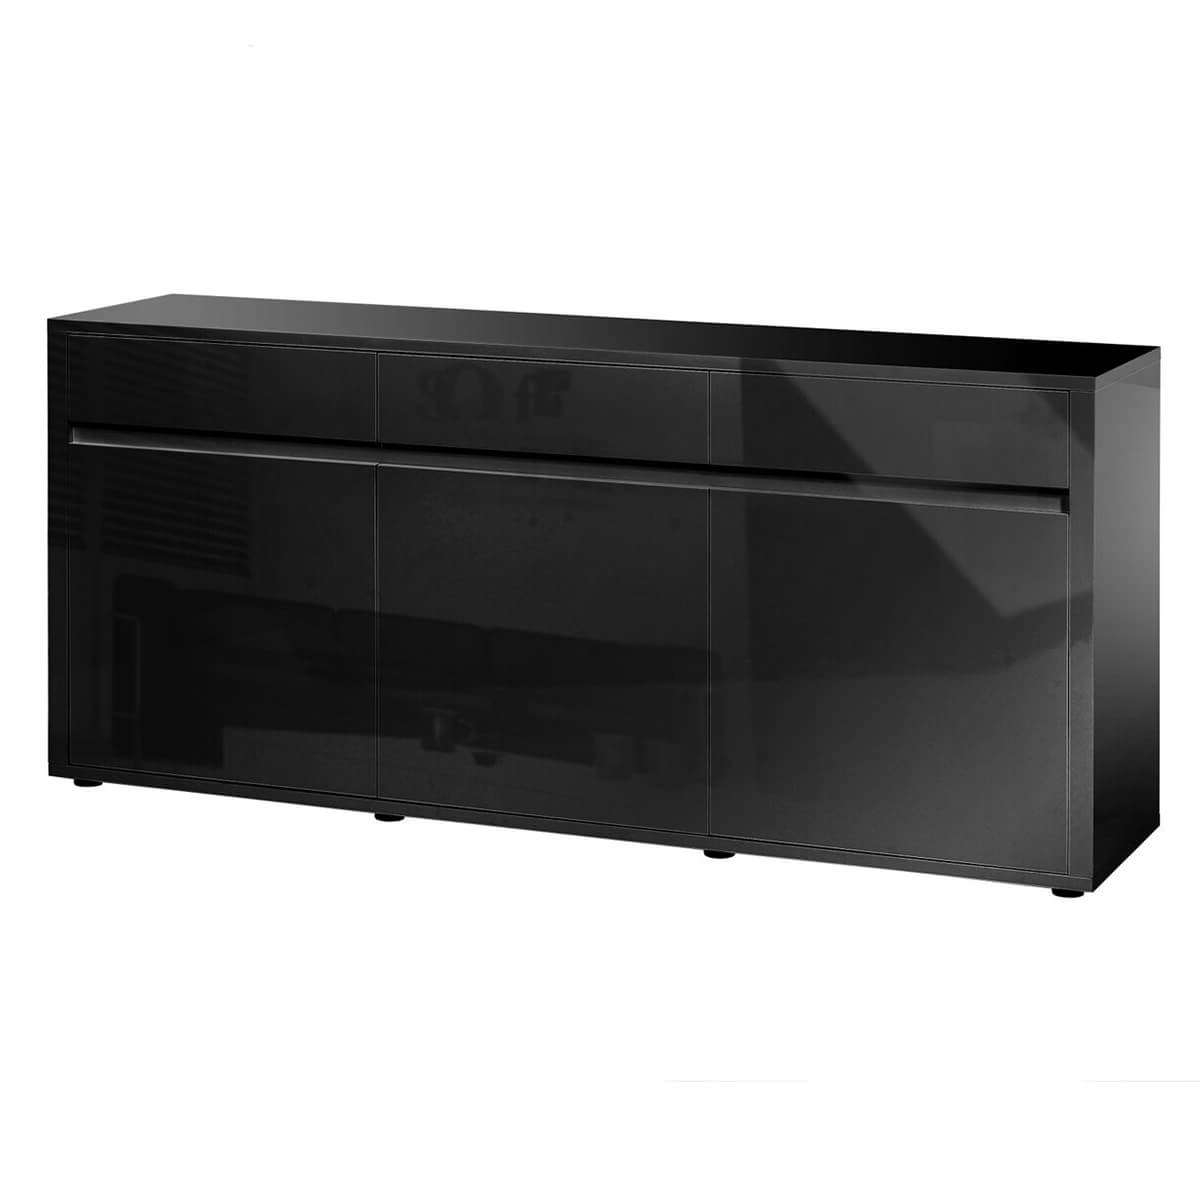 Urbana Black High Gloss Sideboard 3 Door 3 Drawer | Fads Regarding High Gloss Sideboards (View 19 of 20)